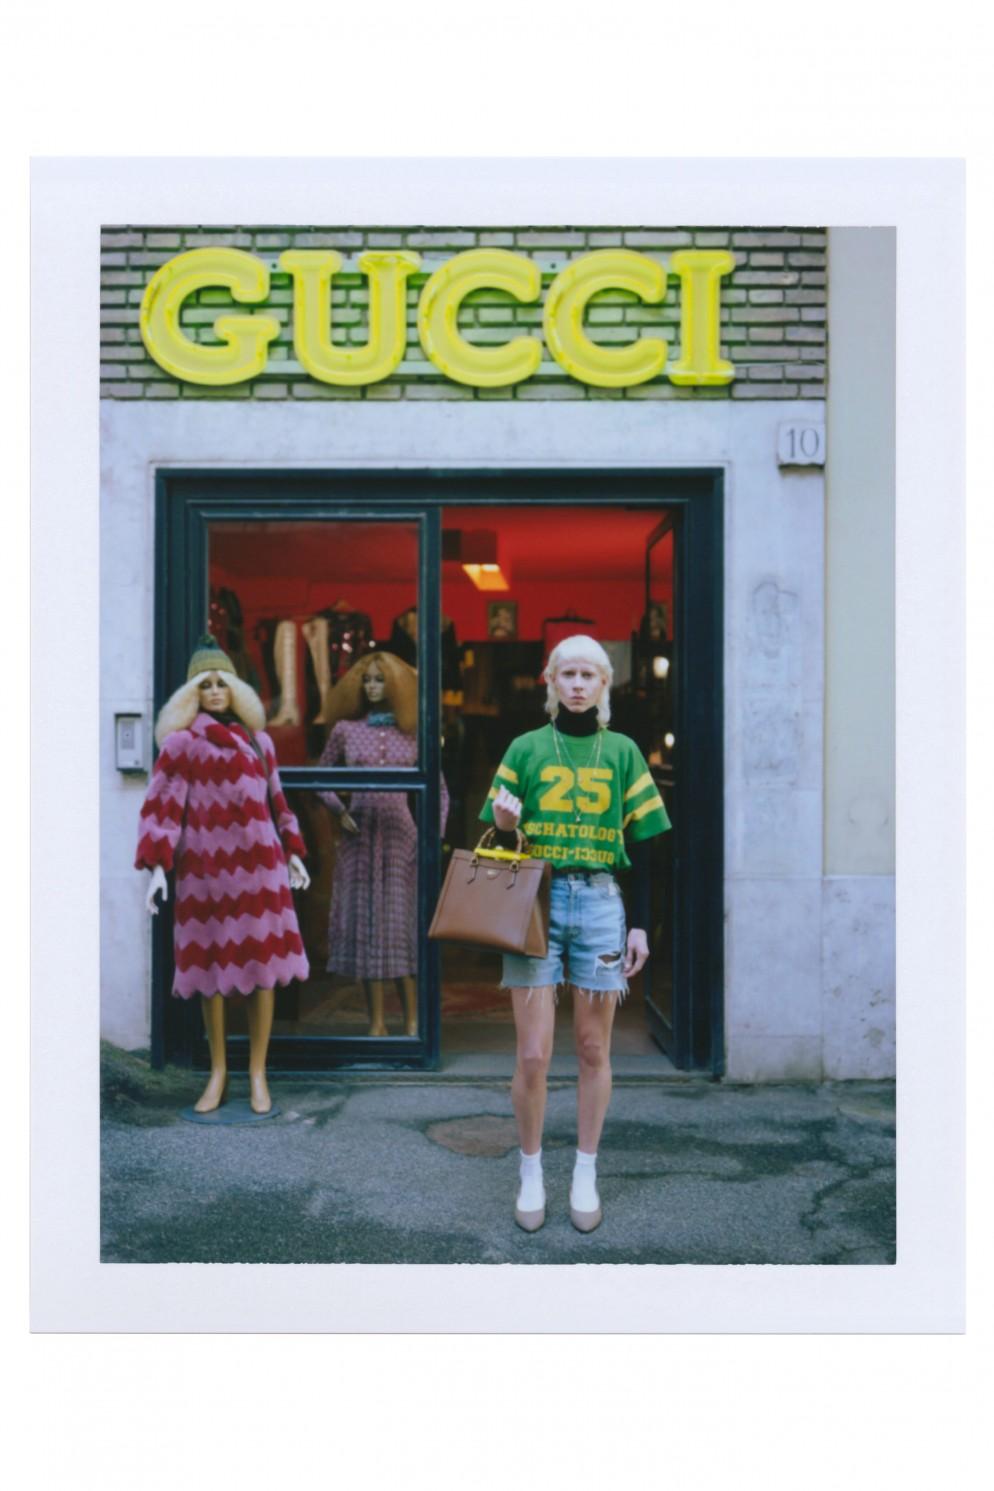 guccifest-gus-van-sant-alessandro-michele-living-corriere-35